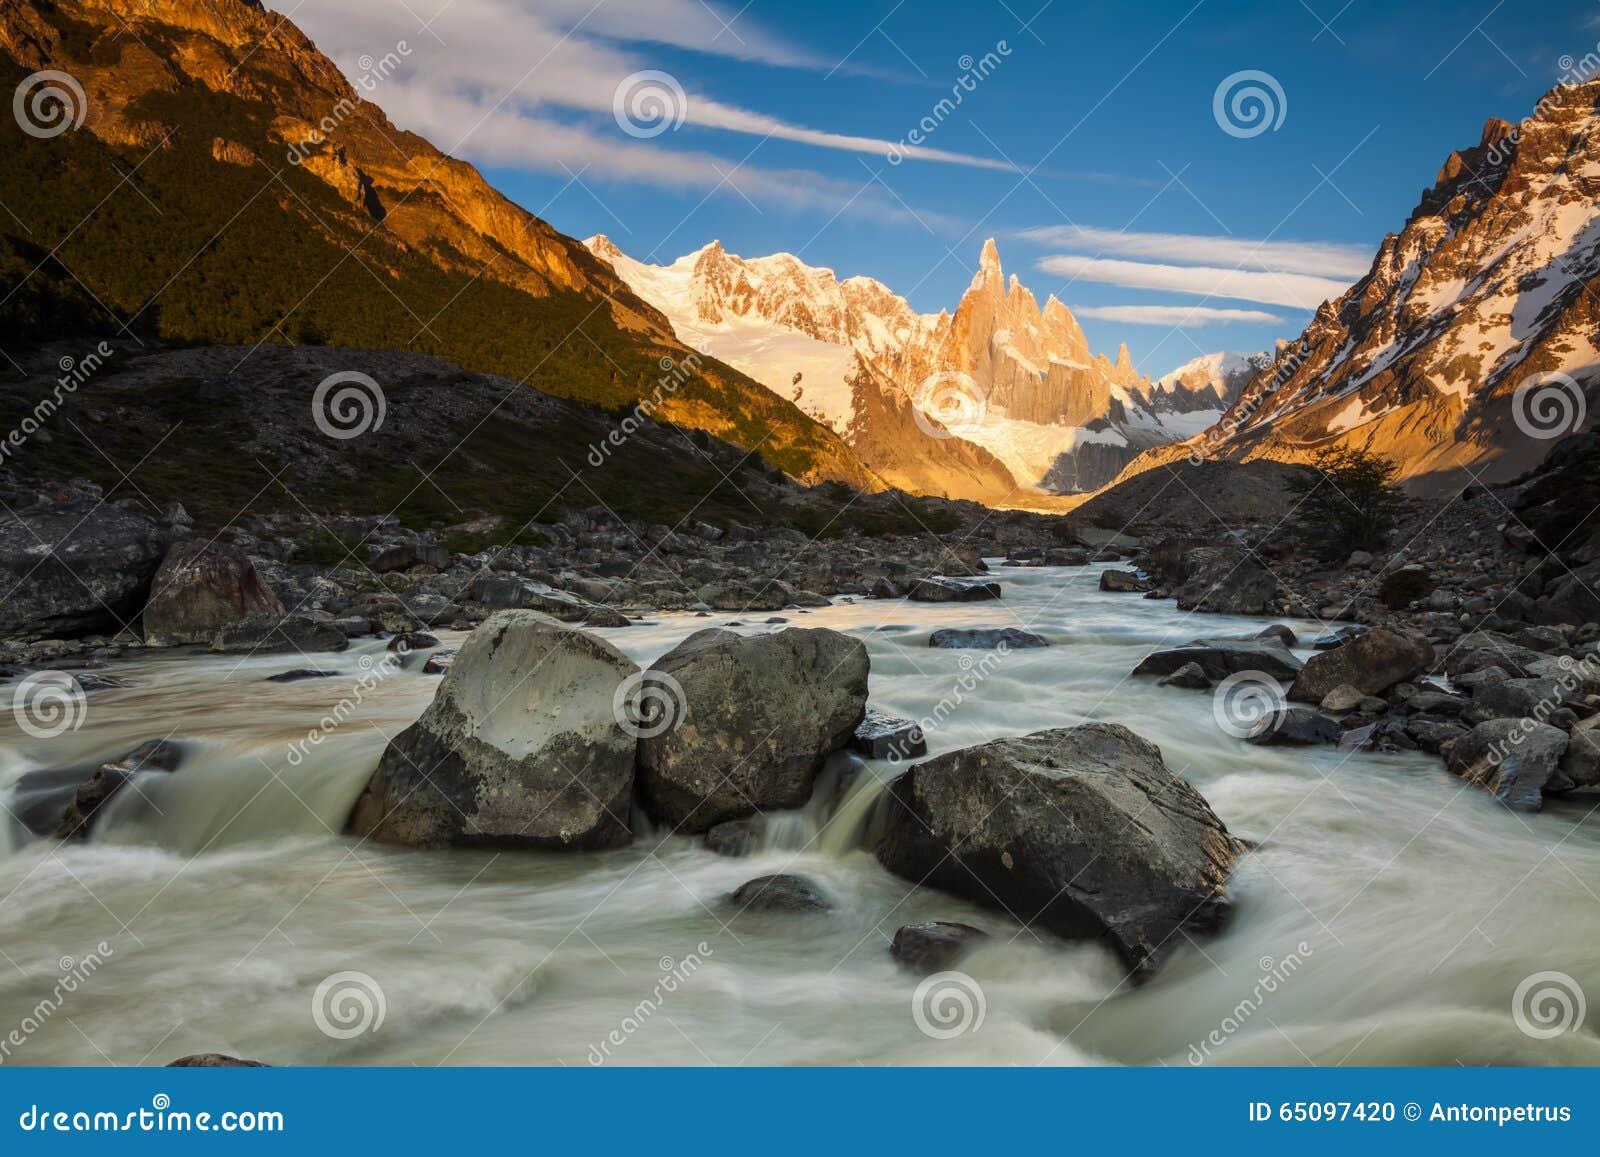 Download Cerro Torre, Los Glaciares National Park, Patagonia, Stock Photo - Image of chile, argentina: 65097420